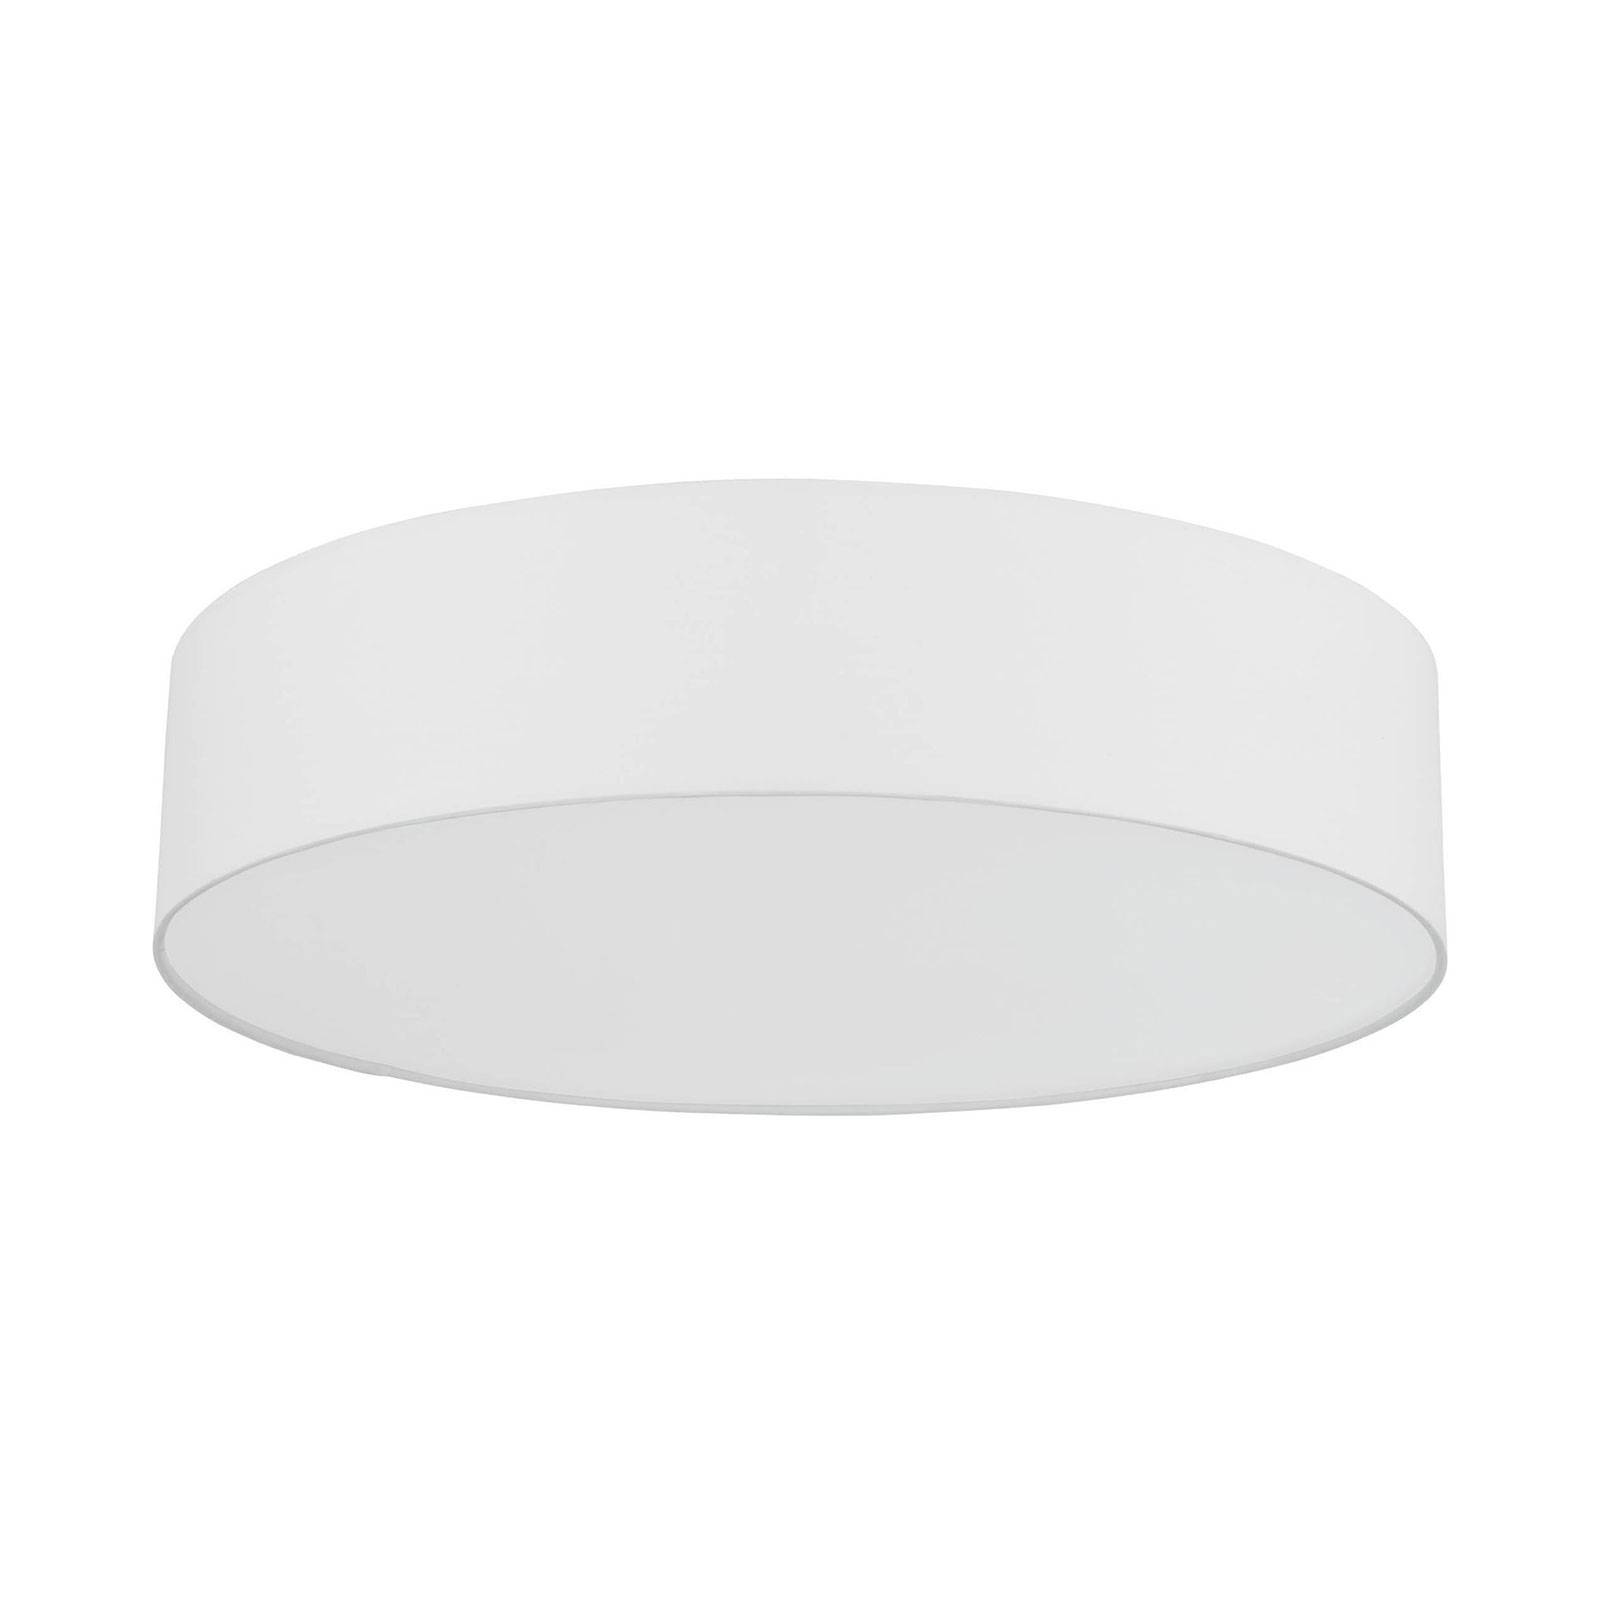 EGLO connect Ramao-C -LED-kattovalaisin 57 cm